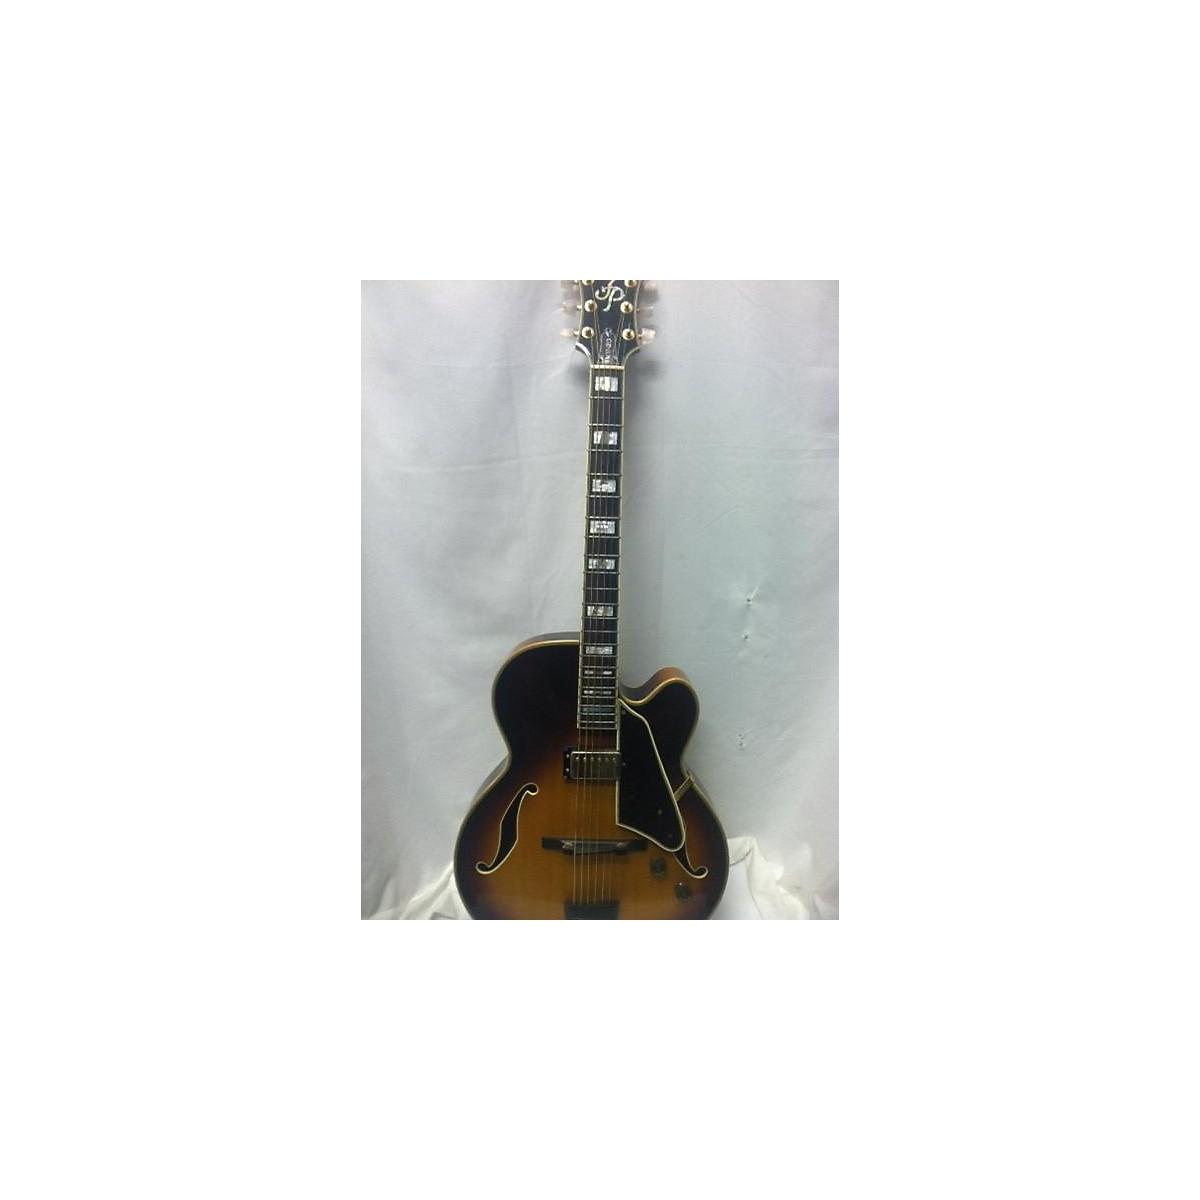 Ibanez 1988 JOE PASS Hollow Body Electric Guitar